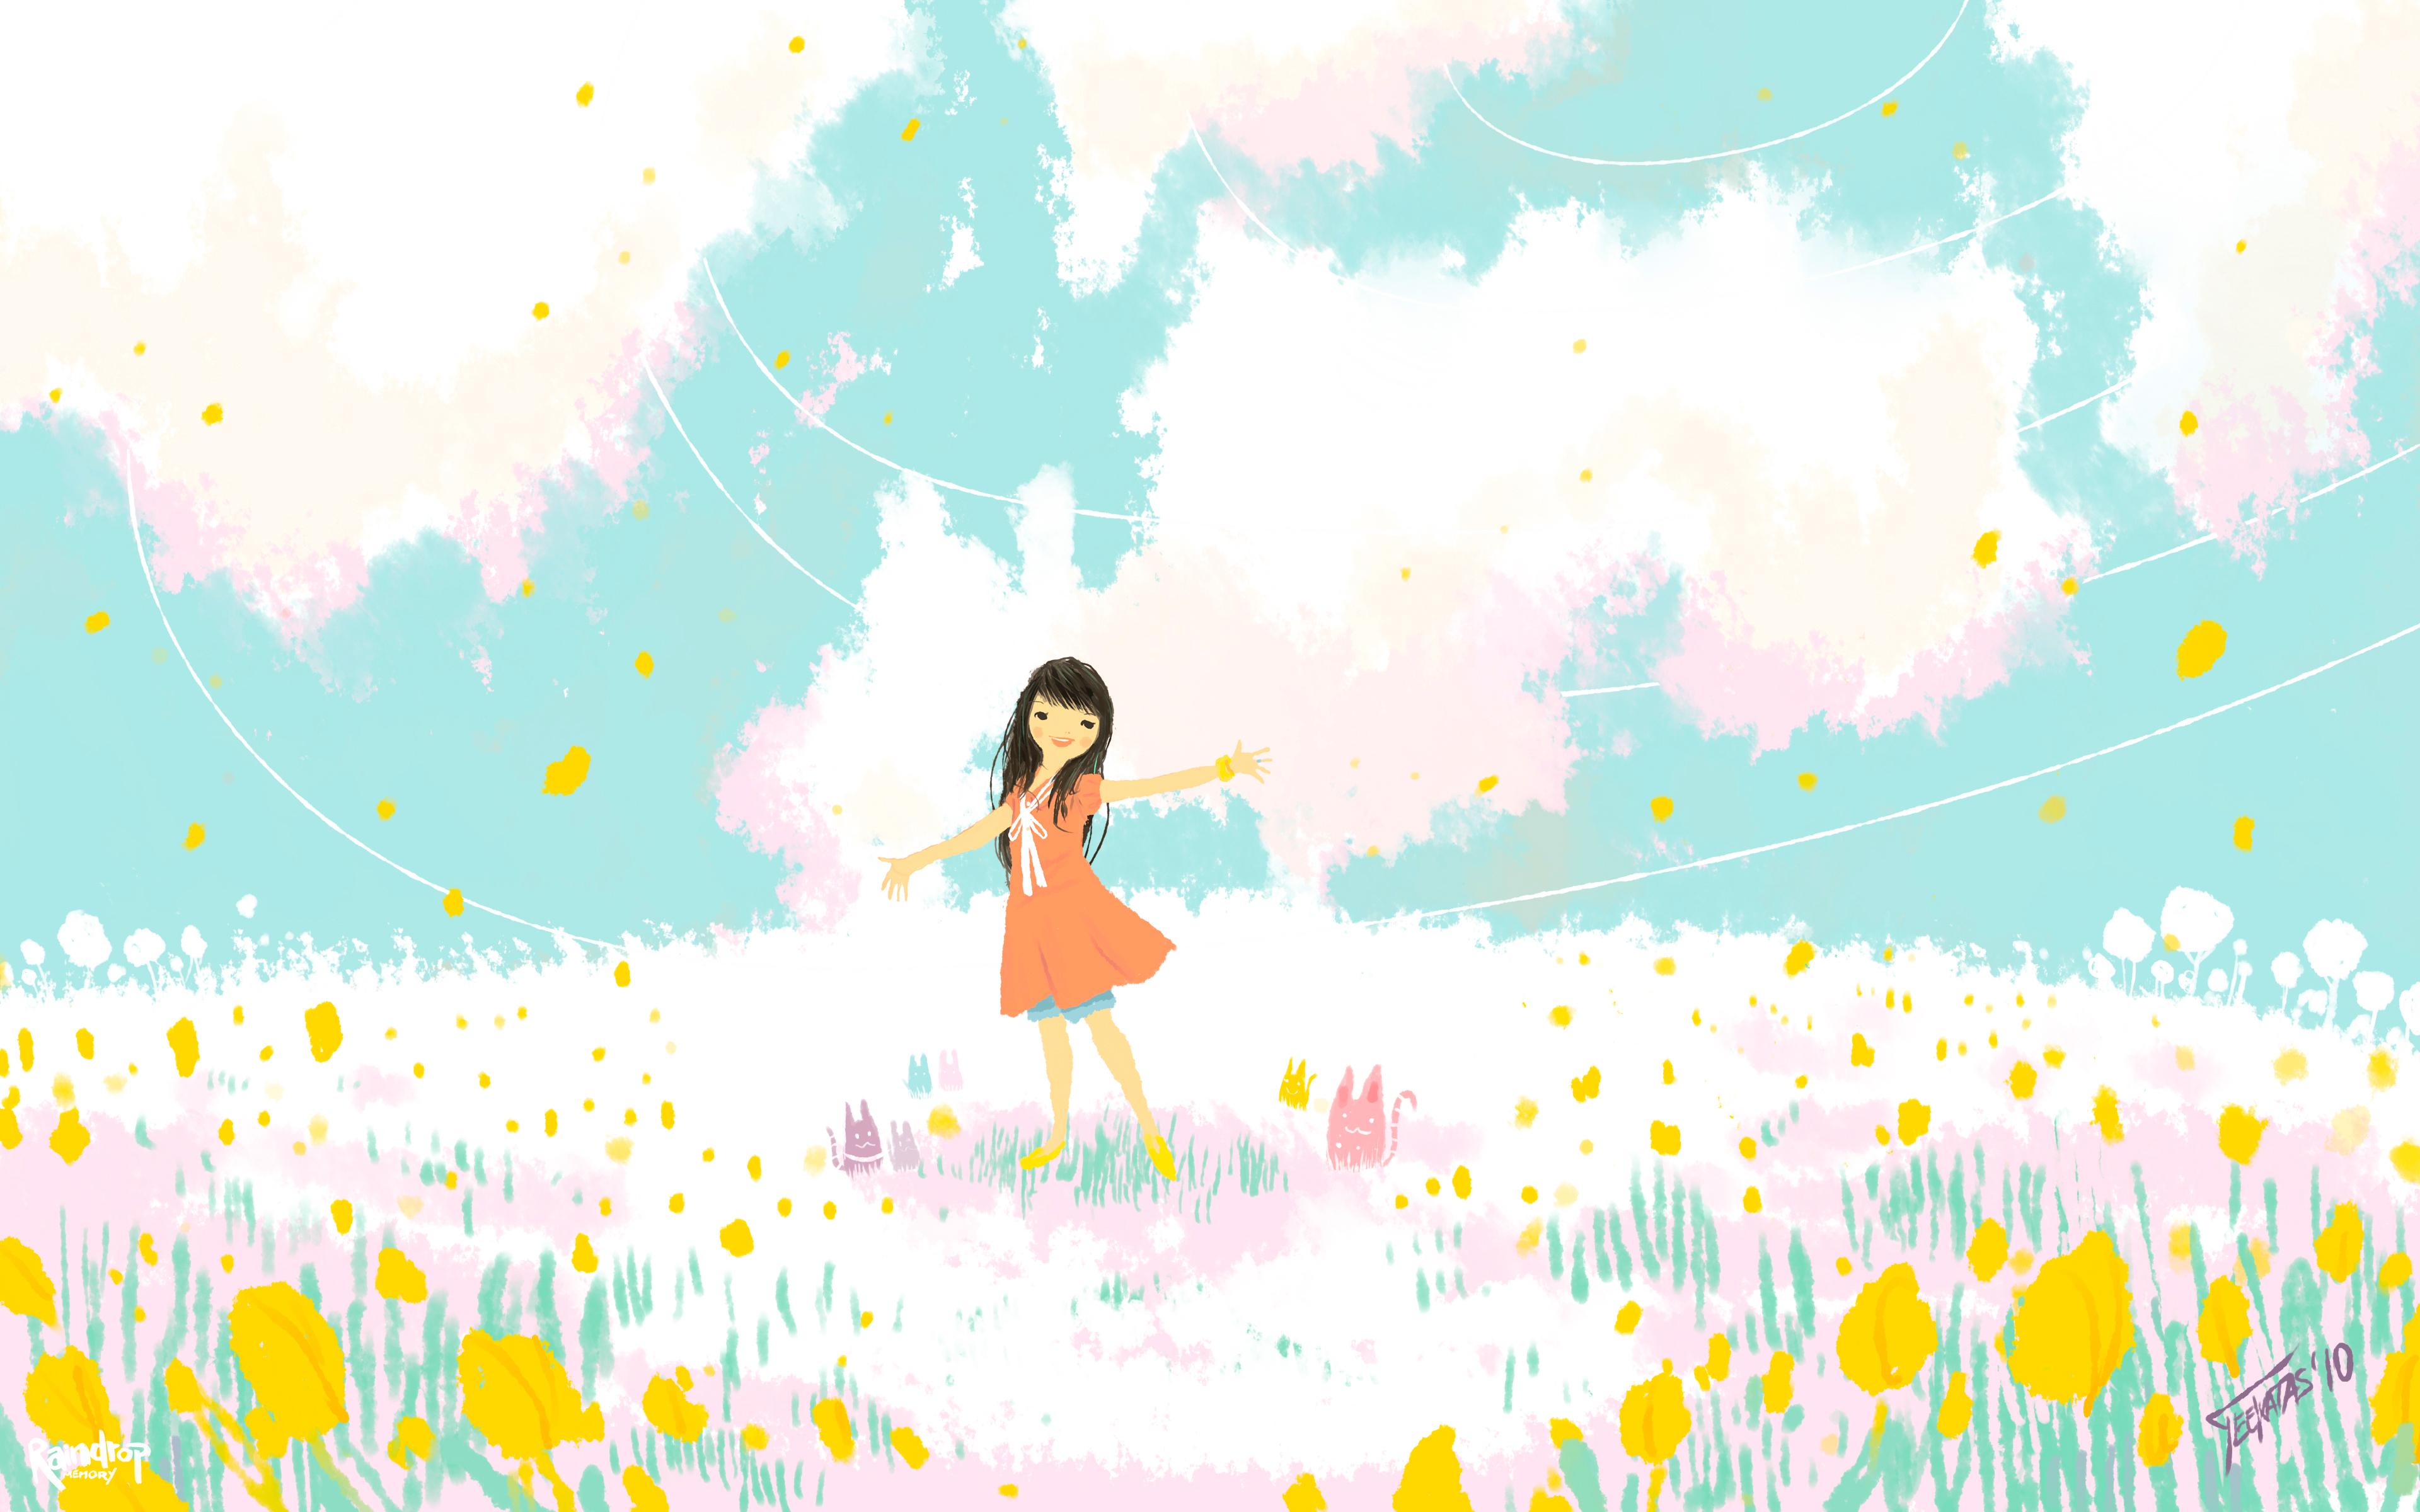 Attrayant Anime   Girl Cartoon Flower Wallpaper